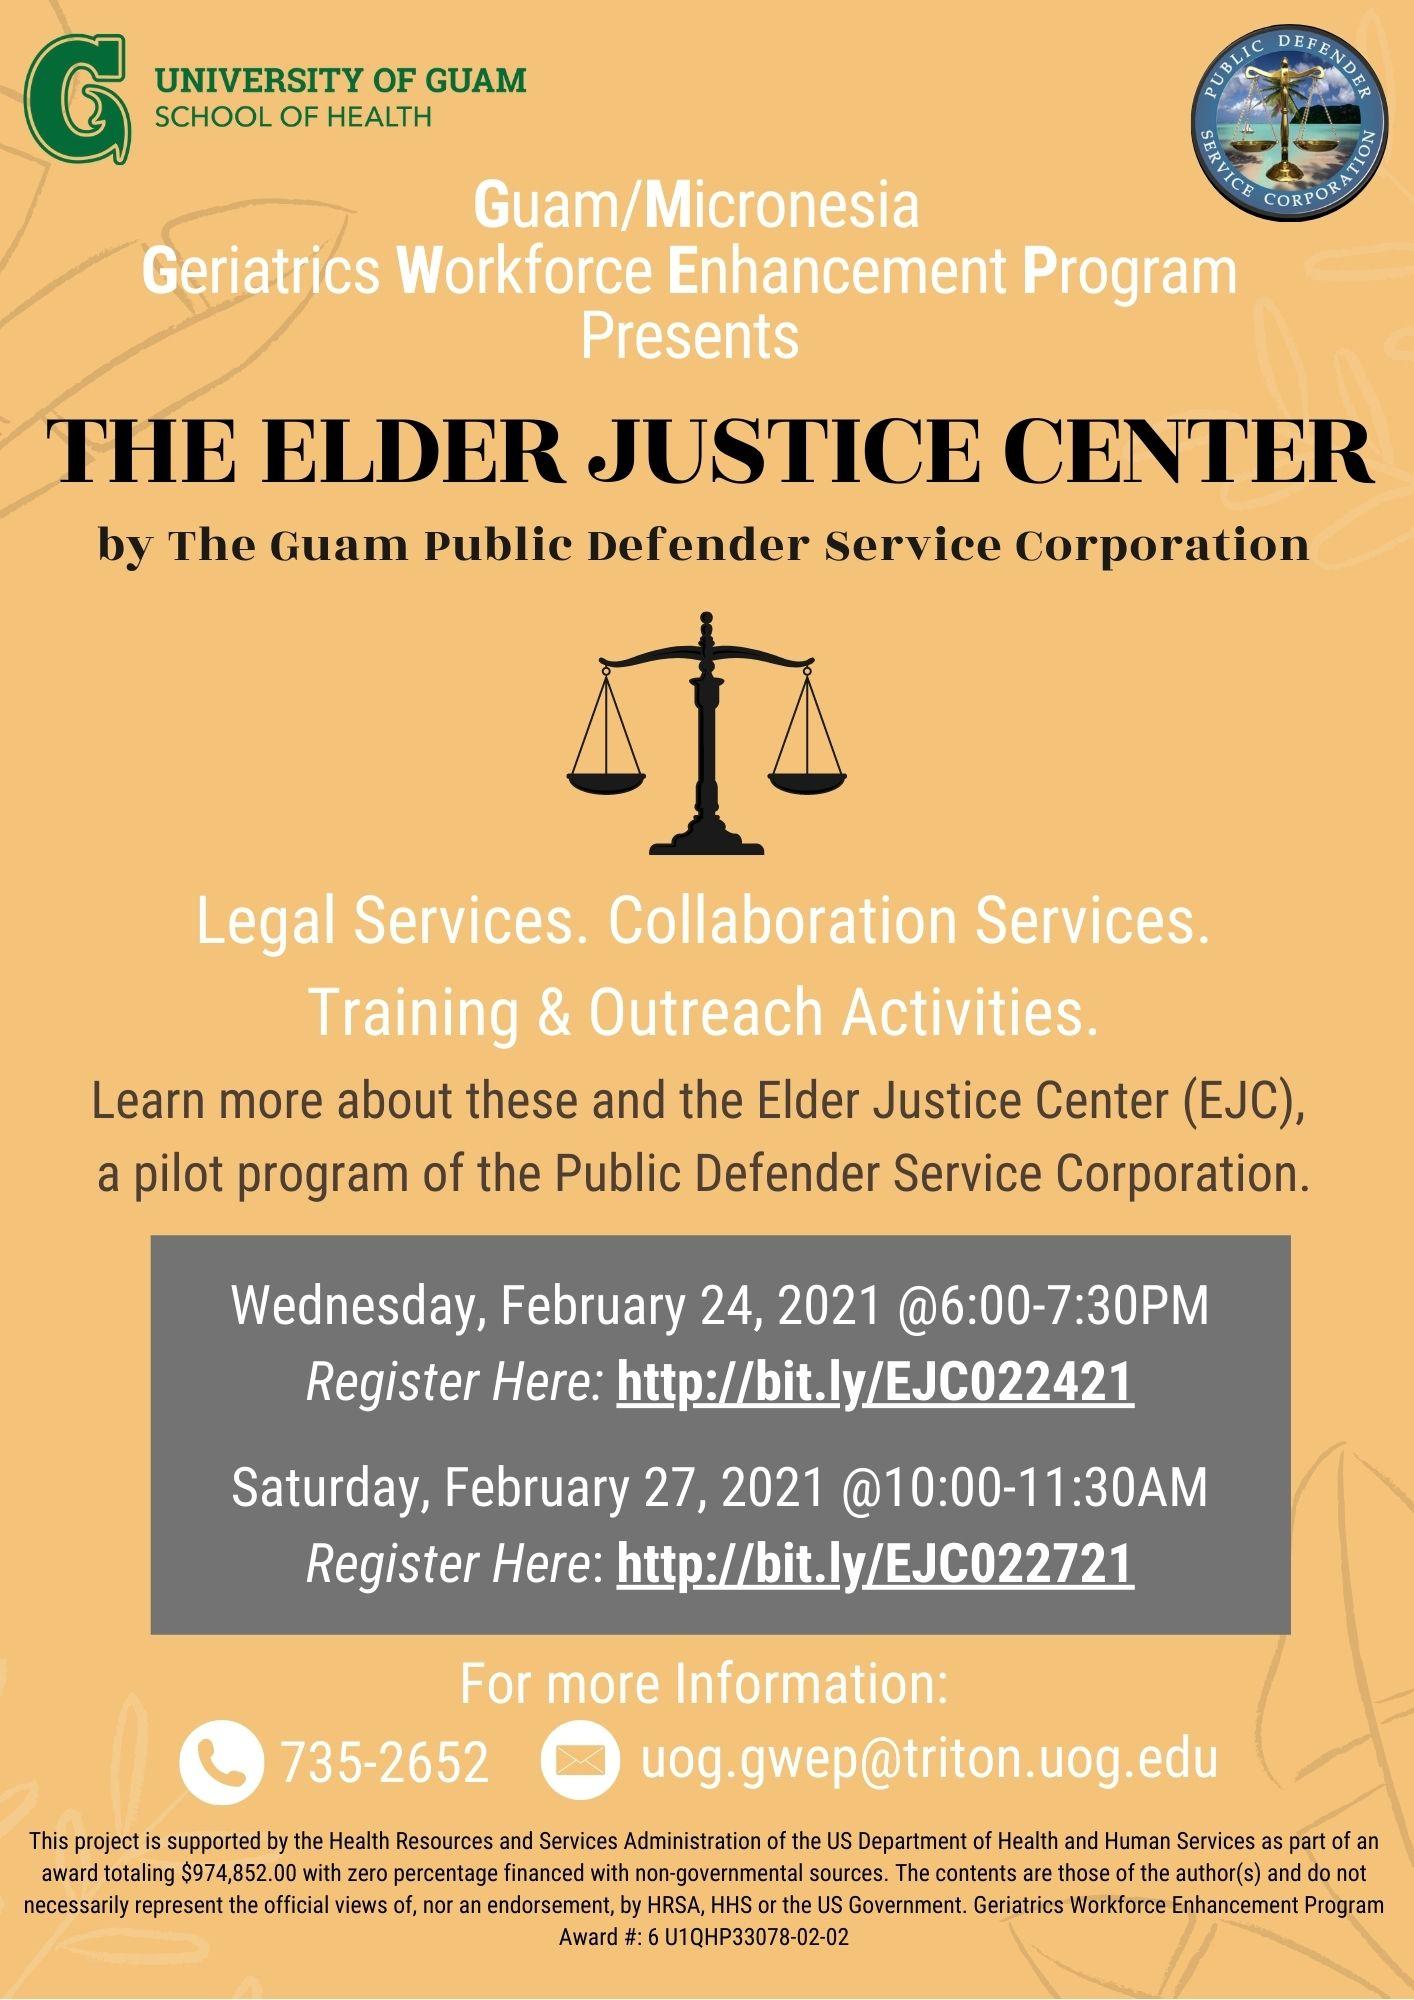 Virtual presentation: Legal services at the Elder Justice Center